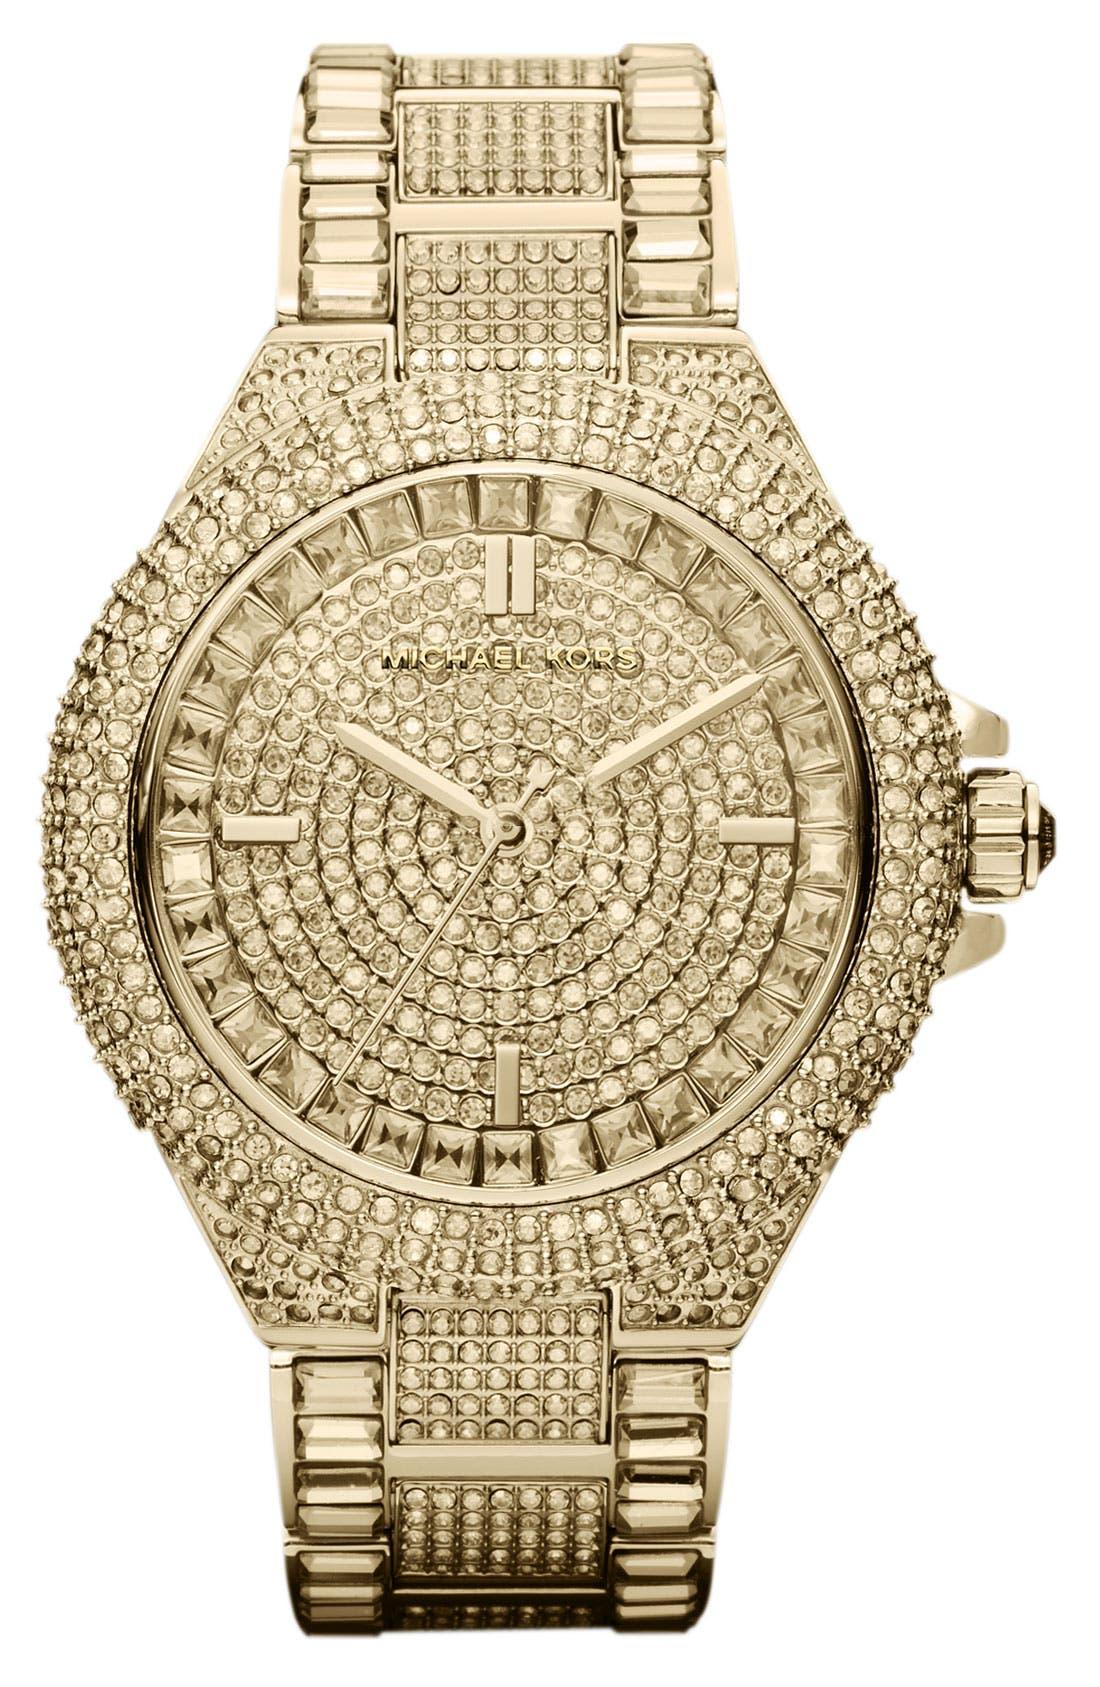 Main Image - Michael Kors 'Camille' Crystal Encrusted Bracelet Watch, 44mm